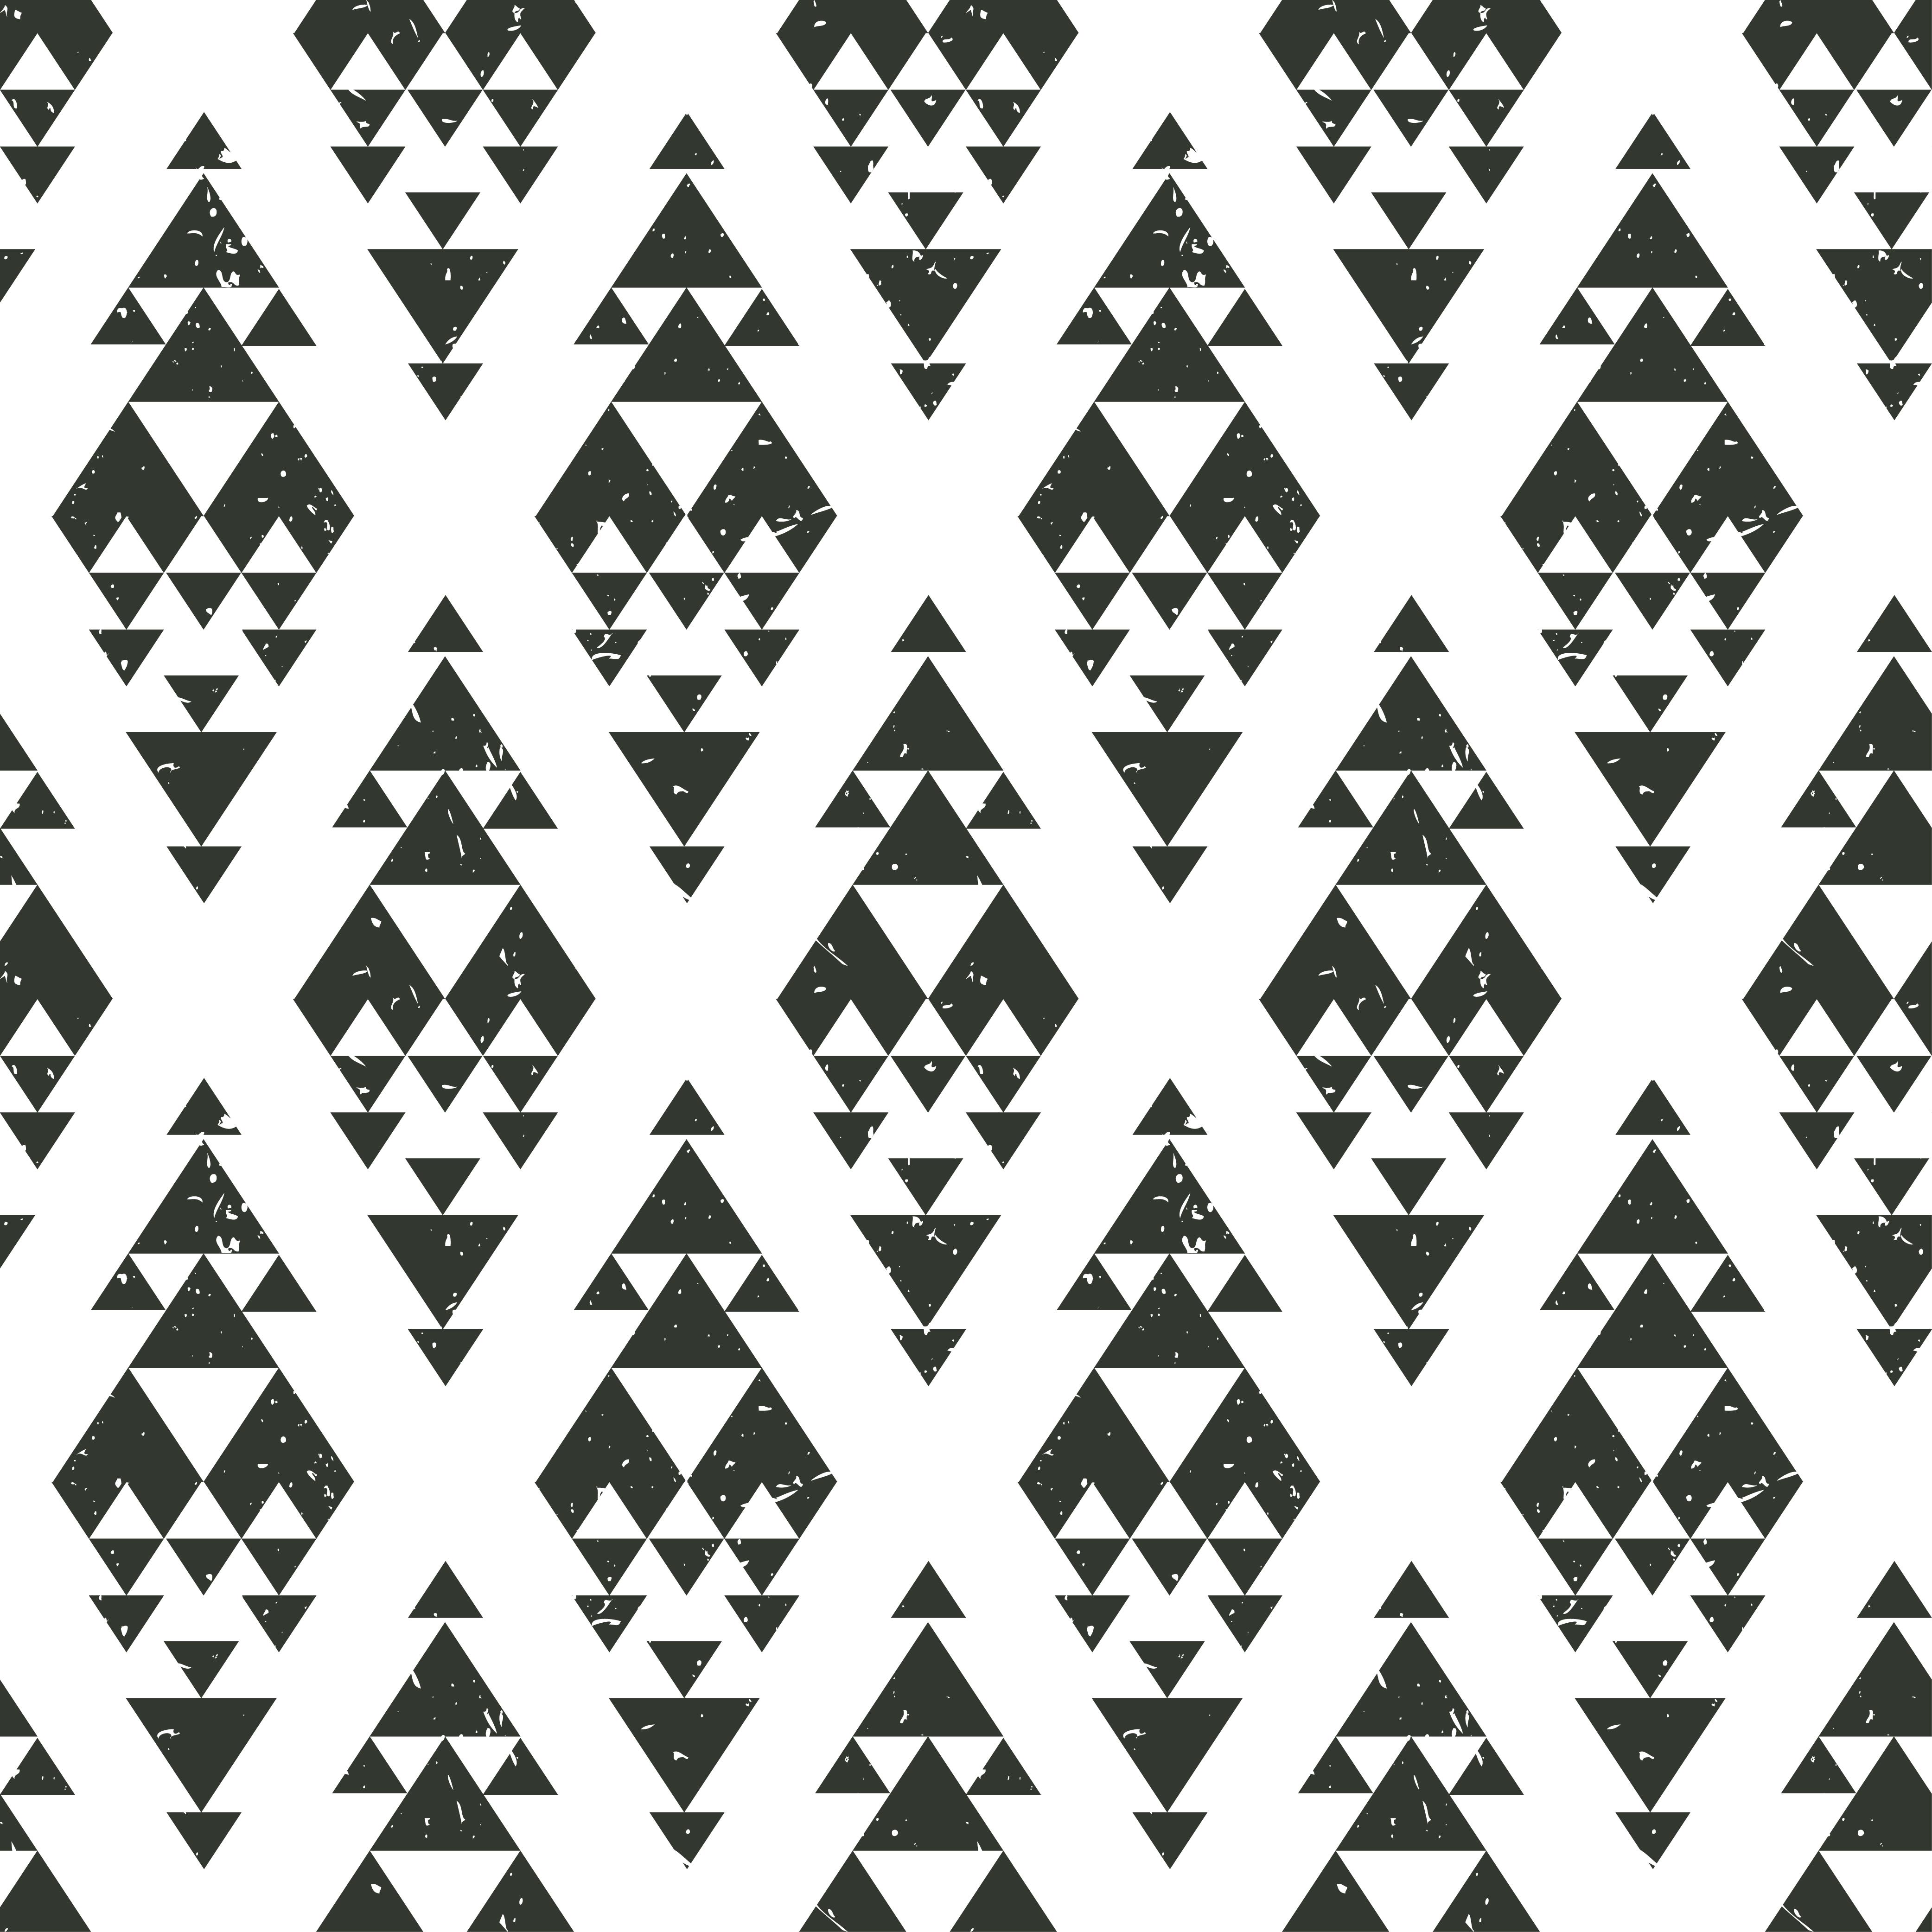 Tribal navajo seamless pattern - Download Free Vector Art ... - photo#34